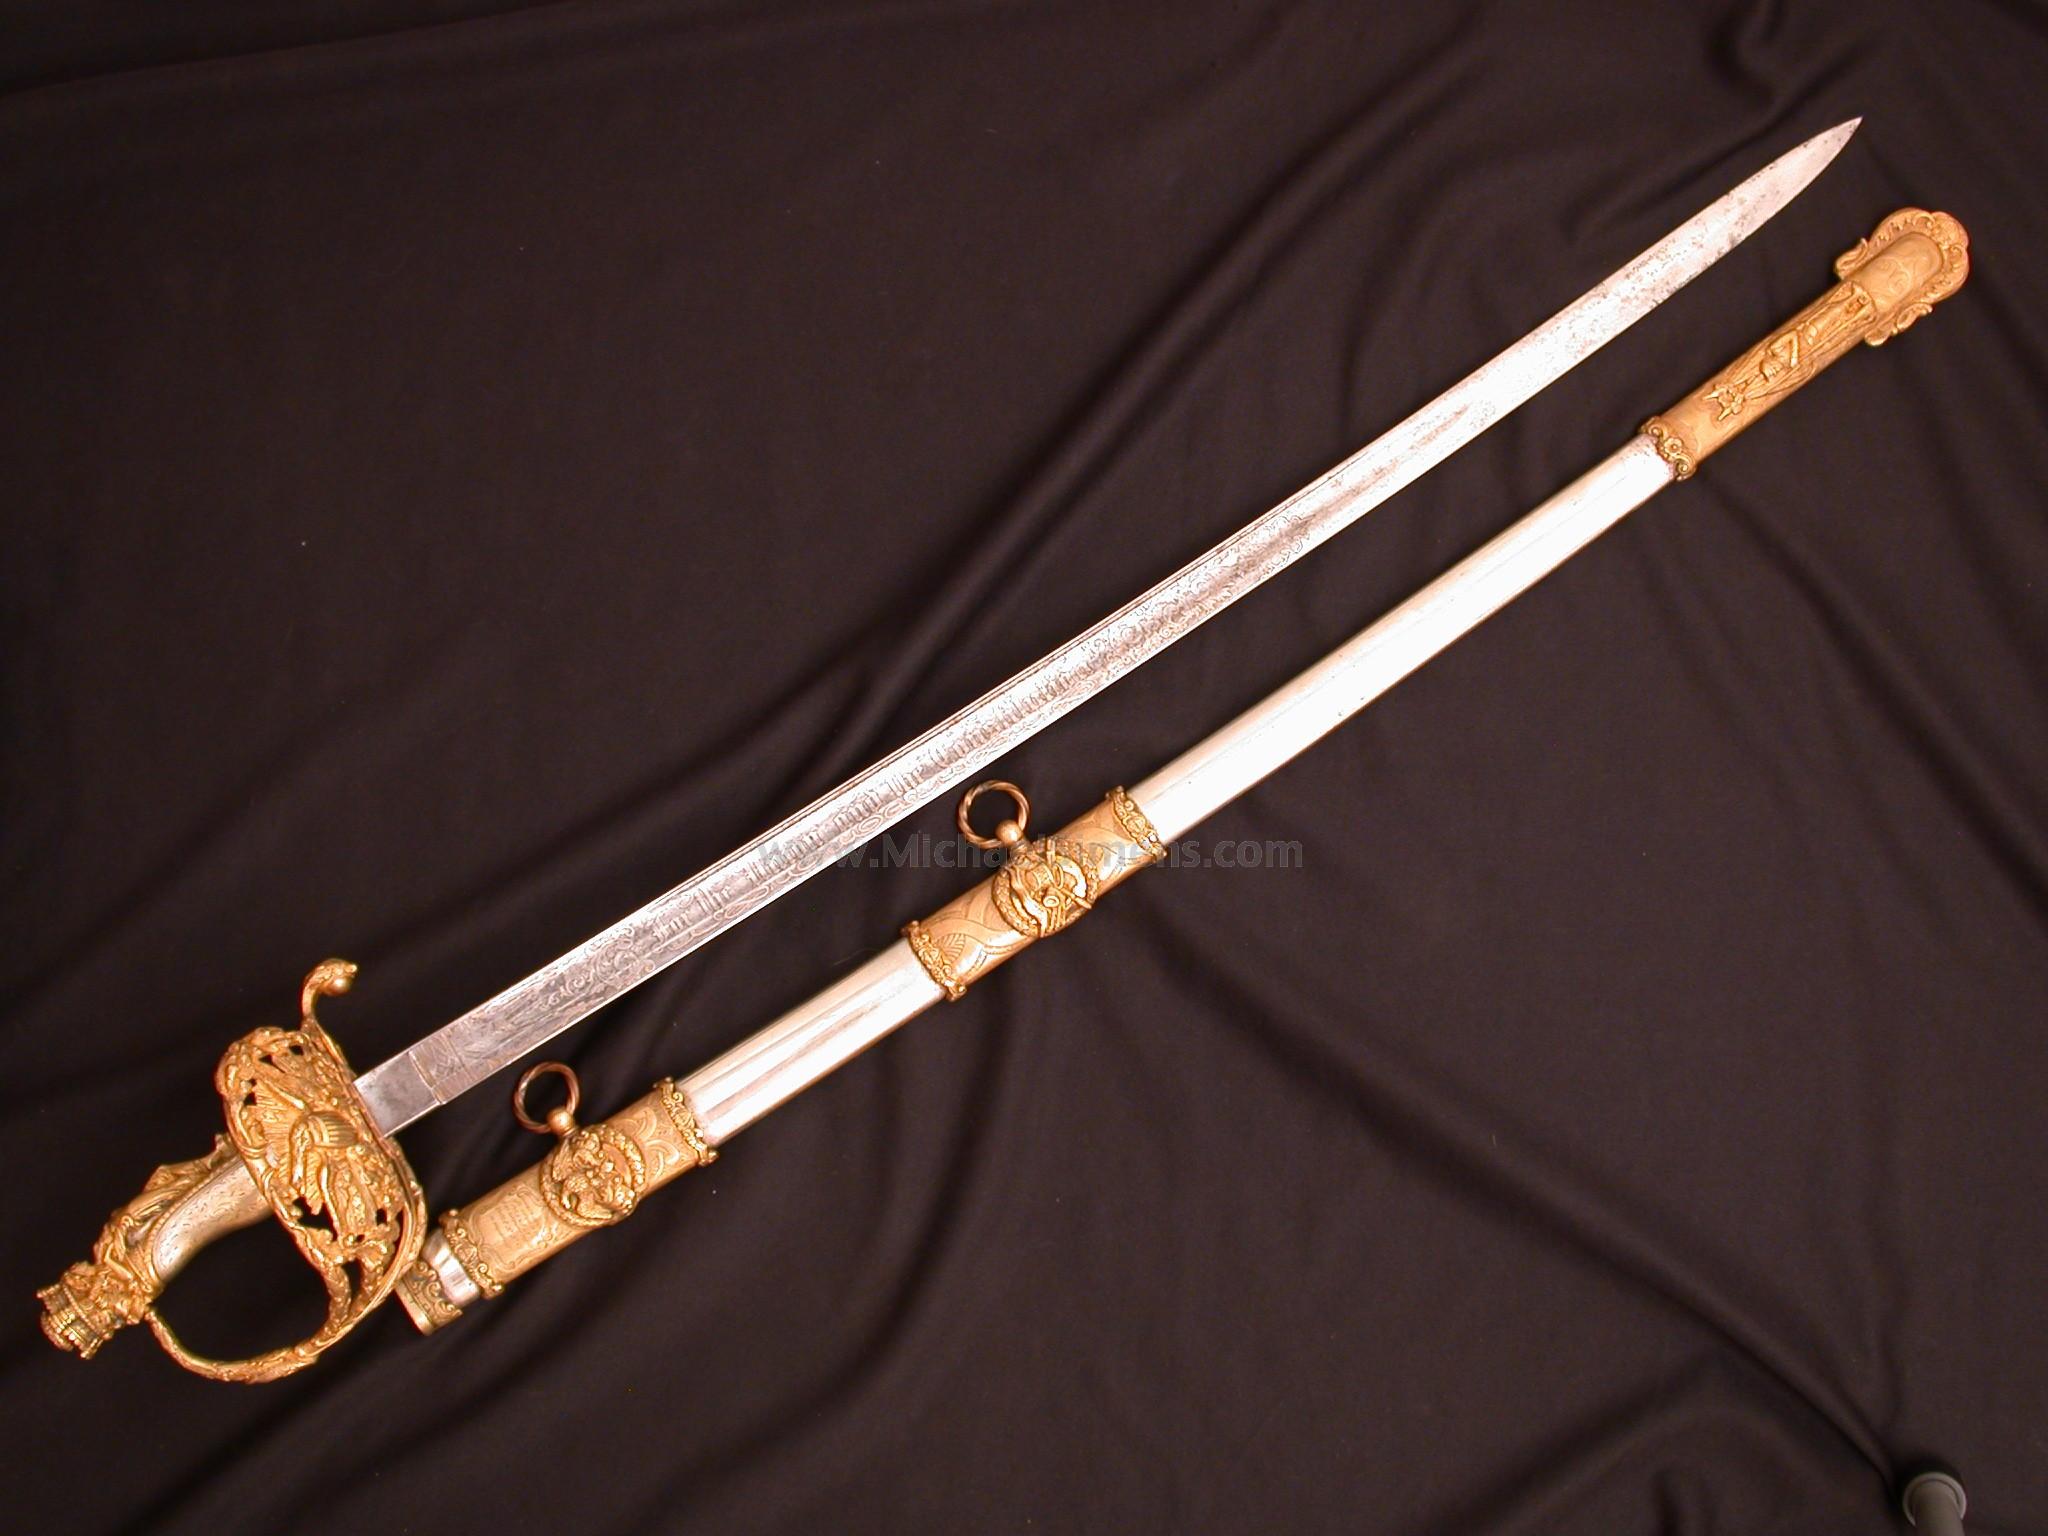 CIVIL WAR PRESENTATION SWORD